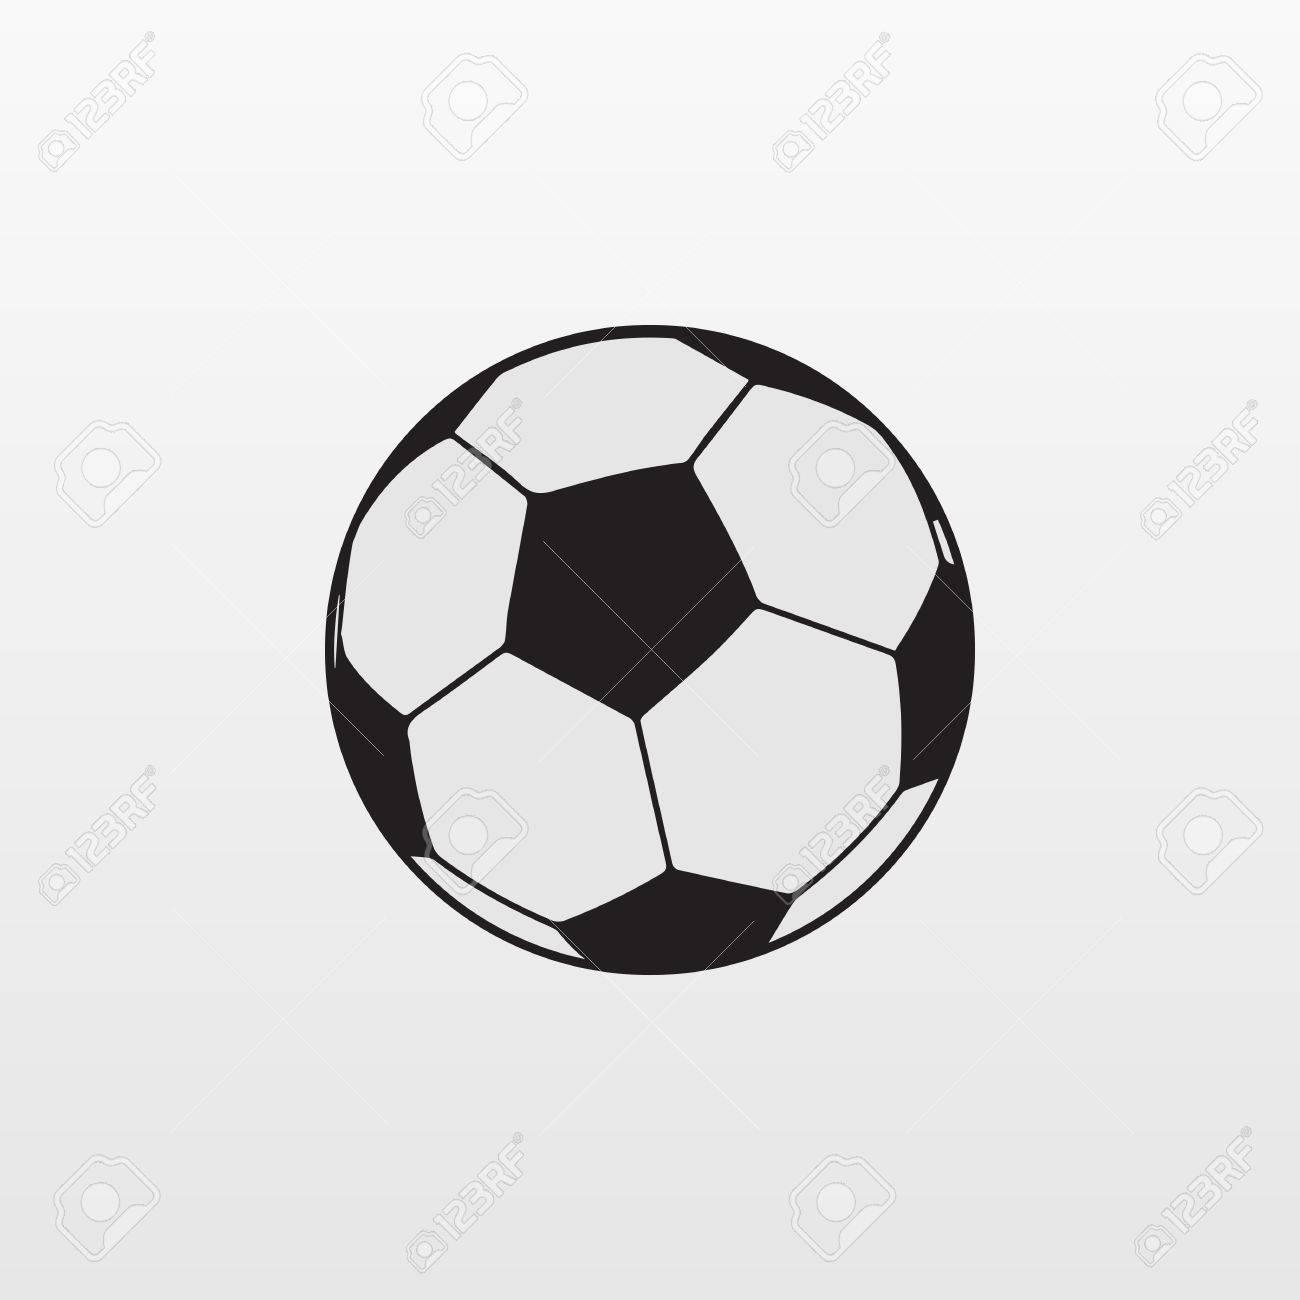 Gray soccer ball icon isolated on background modern simple flat gray soccer ball icon isolated on background modern simple flat football sign sport buycottarizona